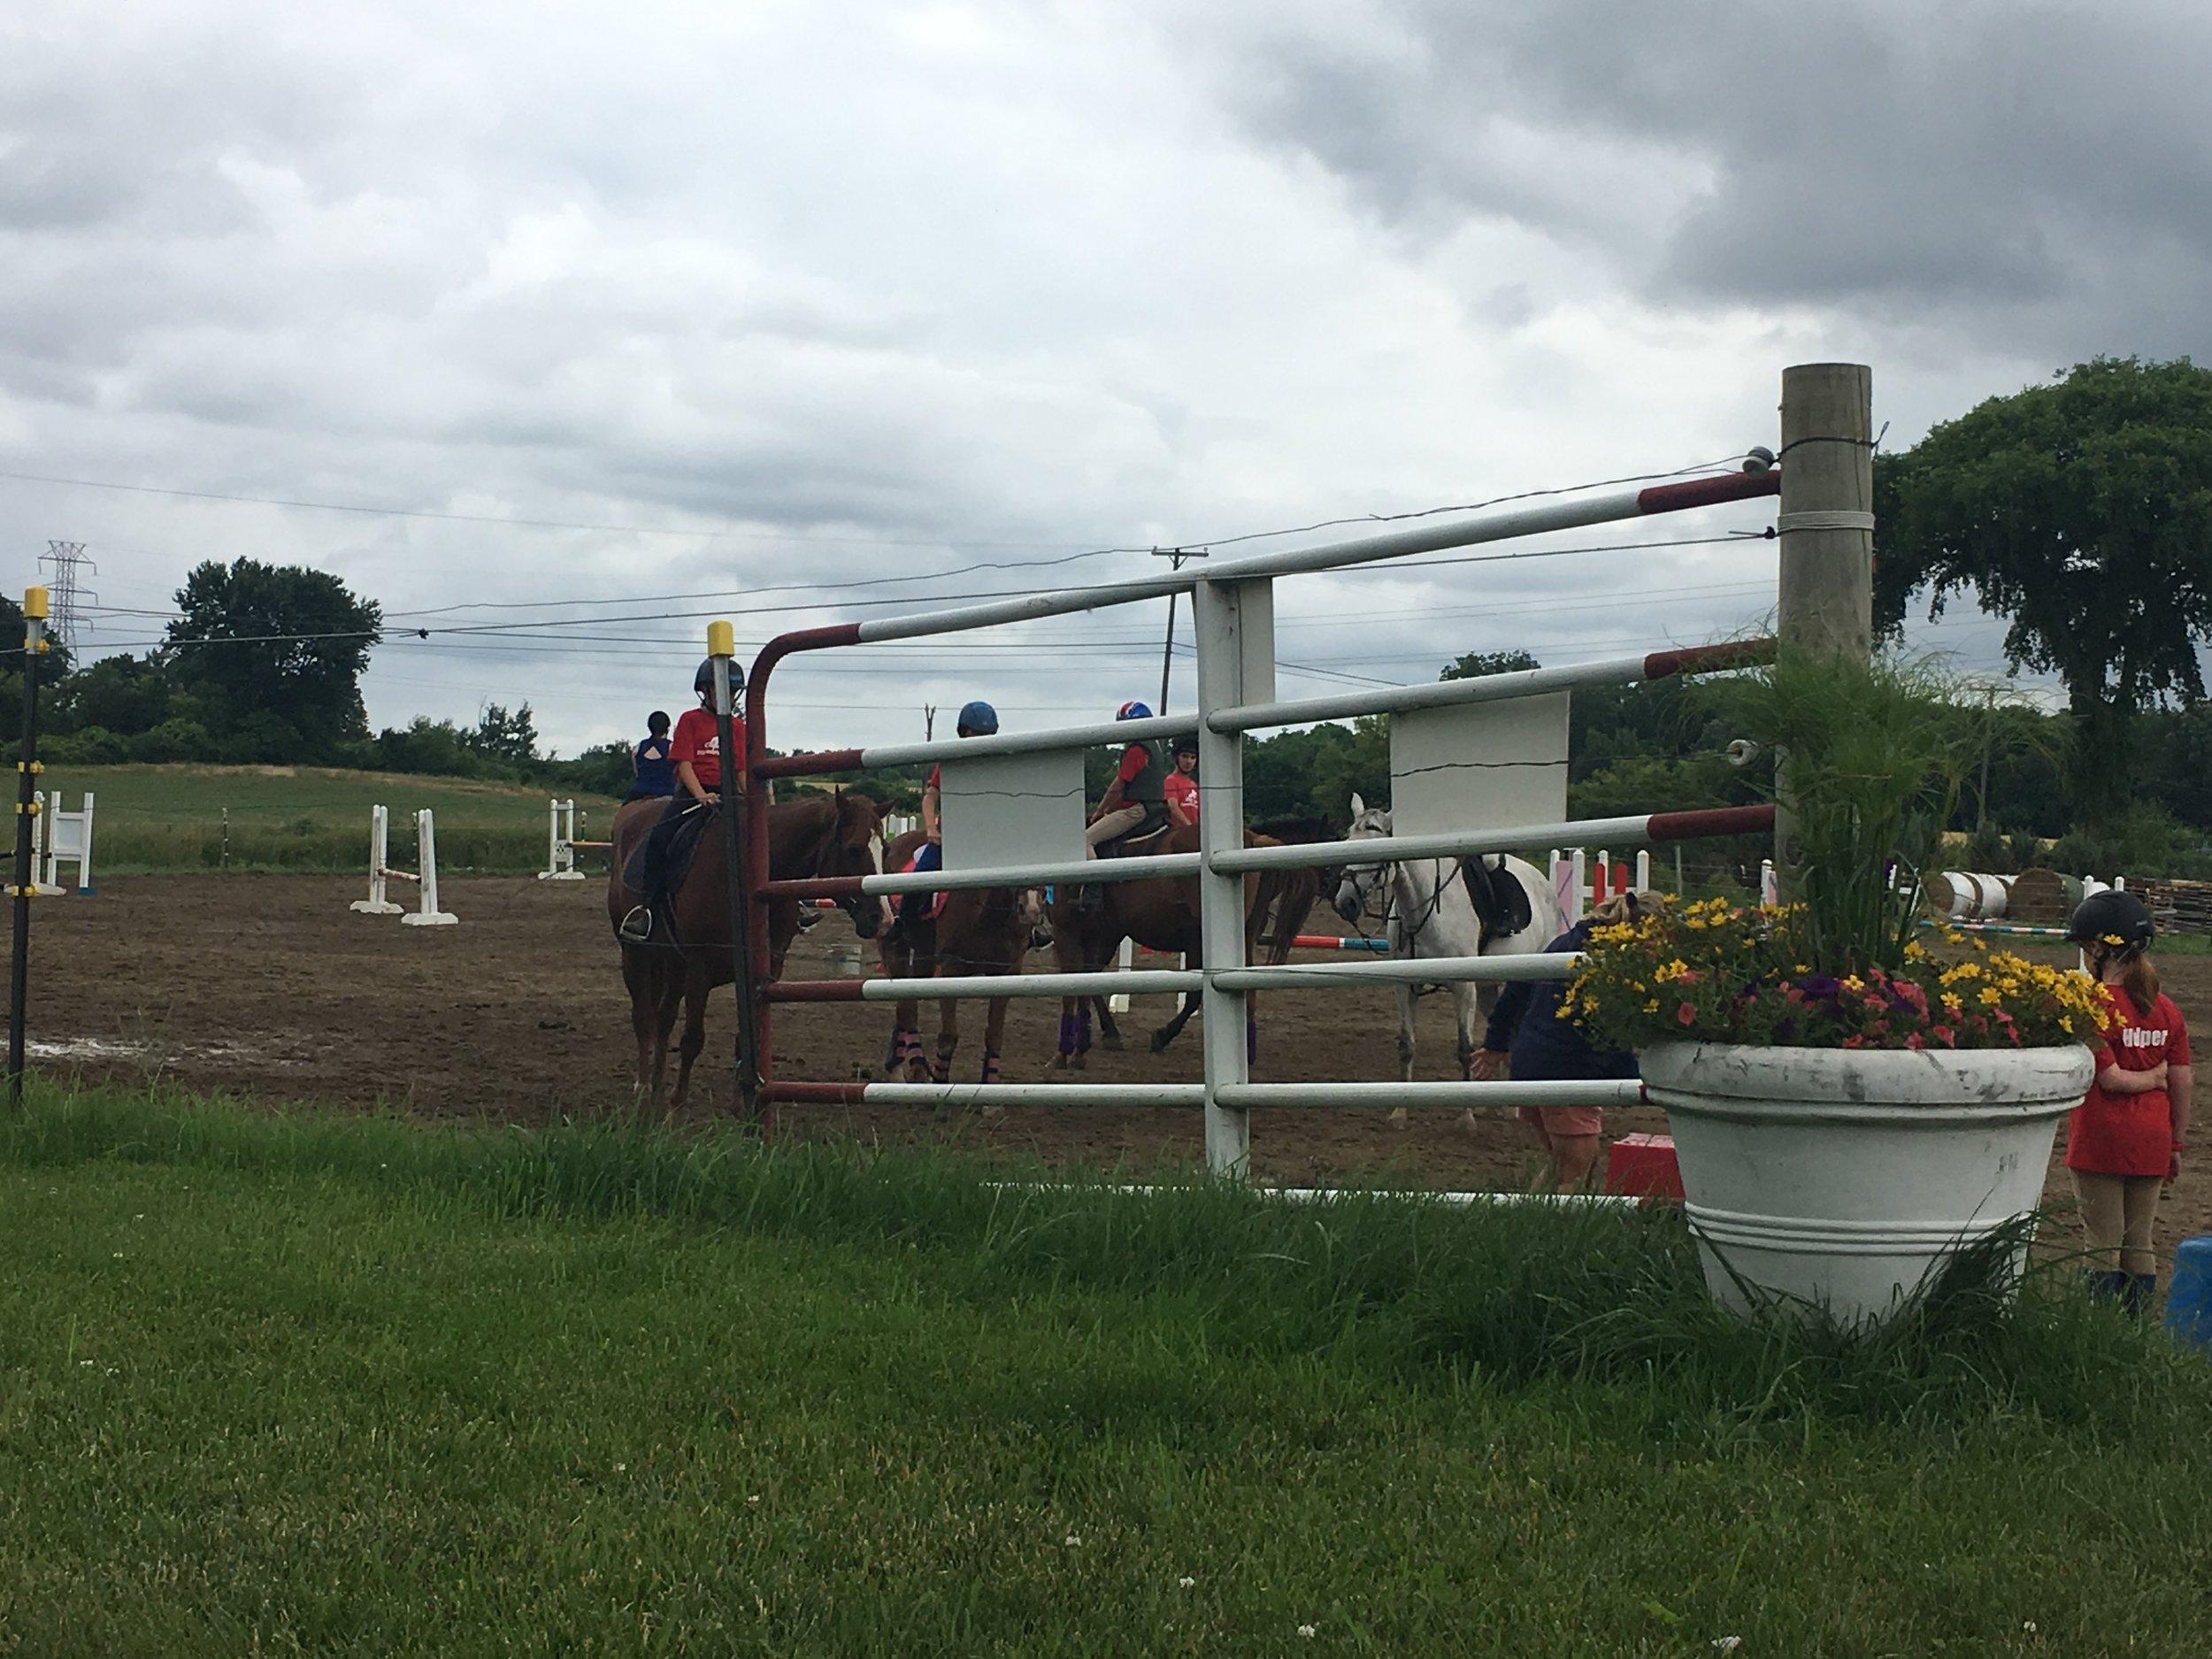 Summer Fun - SAFETY, HORSEMANSHIP, FUN